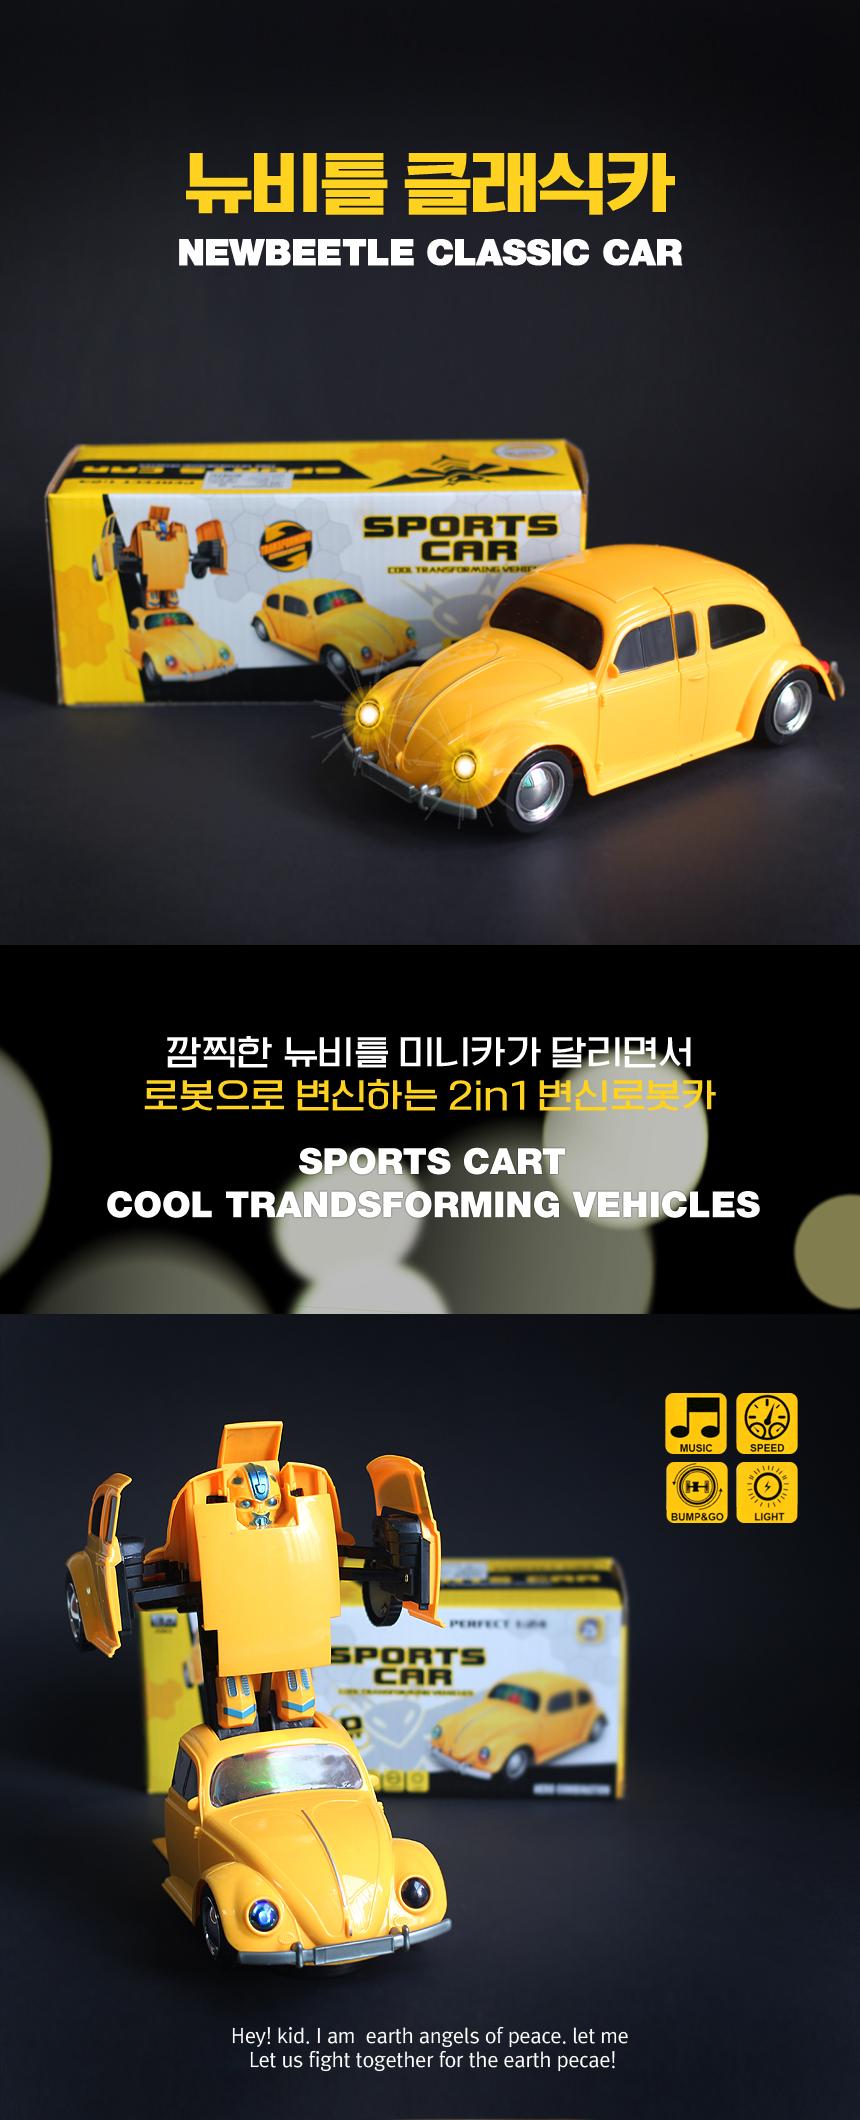 newbeetle_car_01.jpg